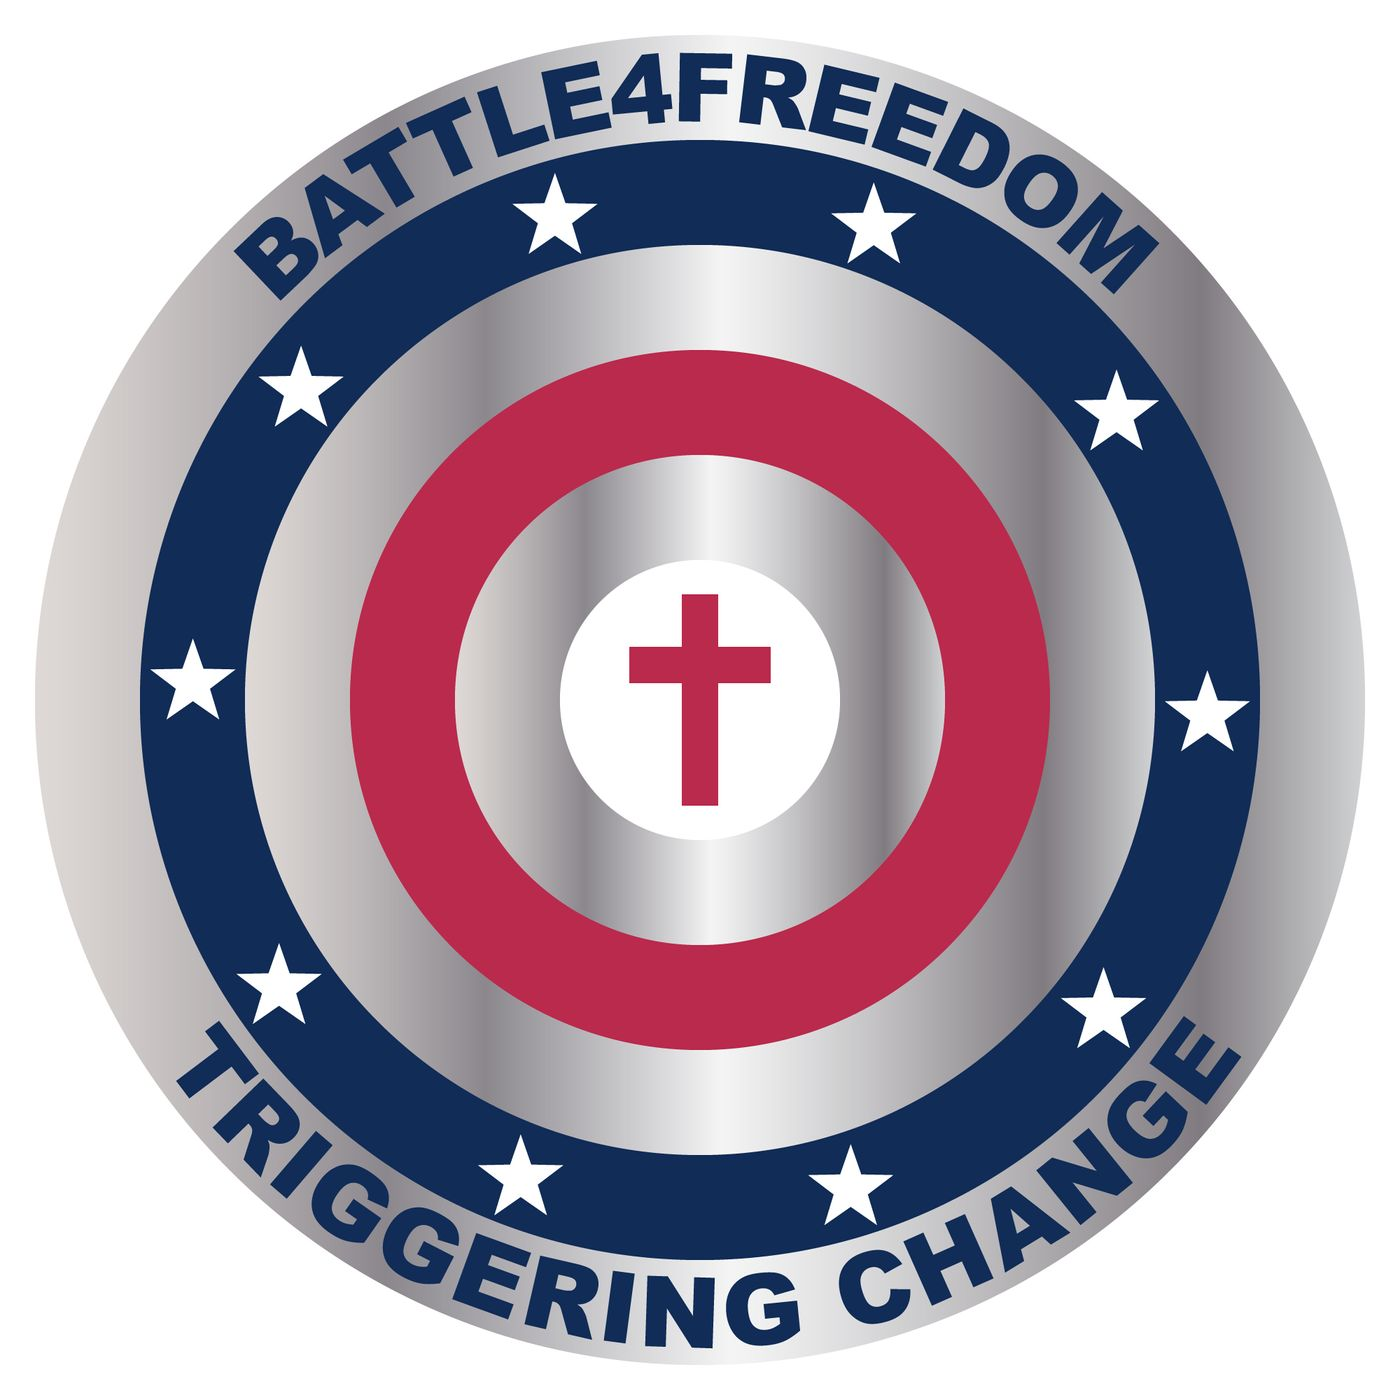 Battle4Freedom - 20210611 - Considering the Chosen